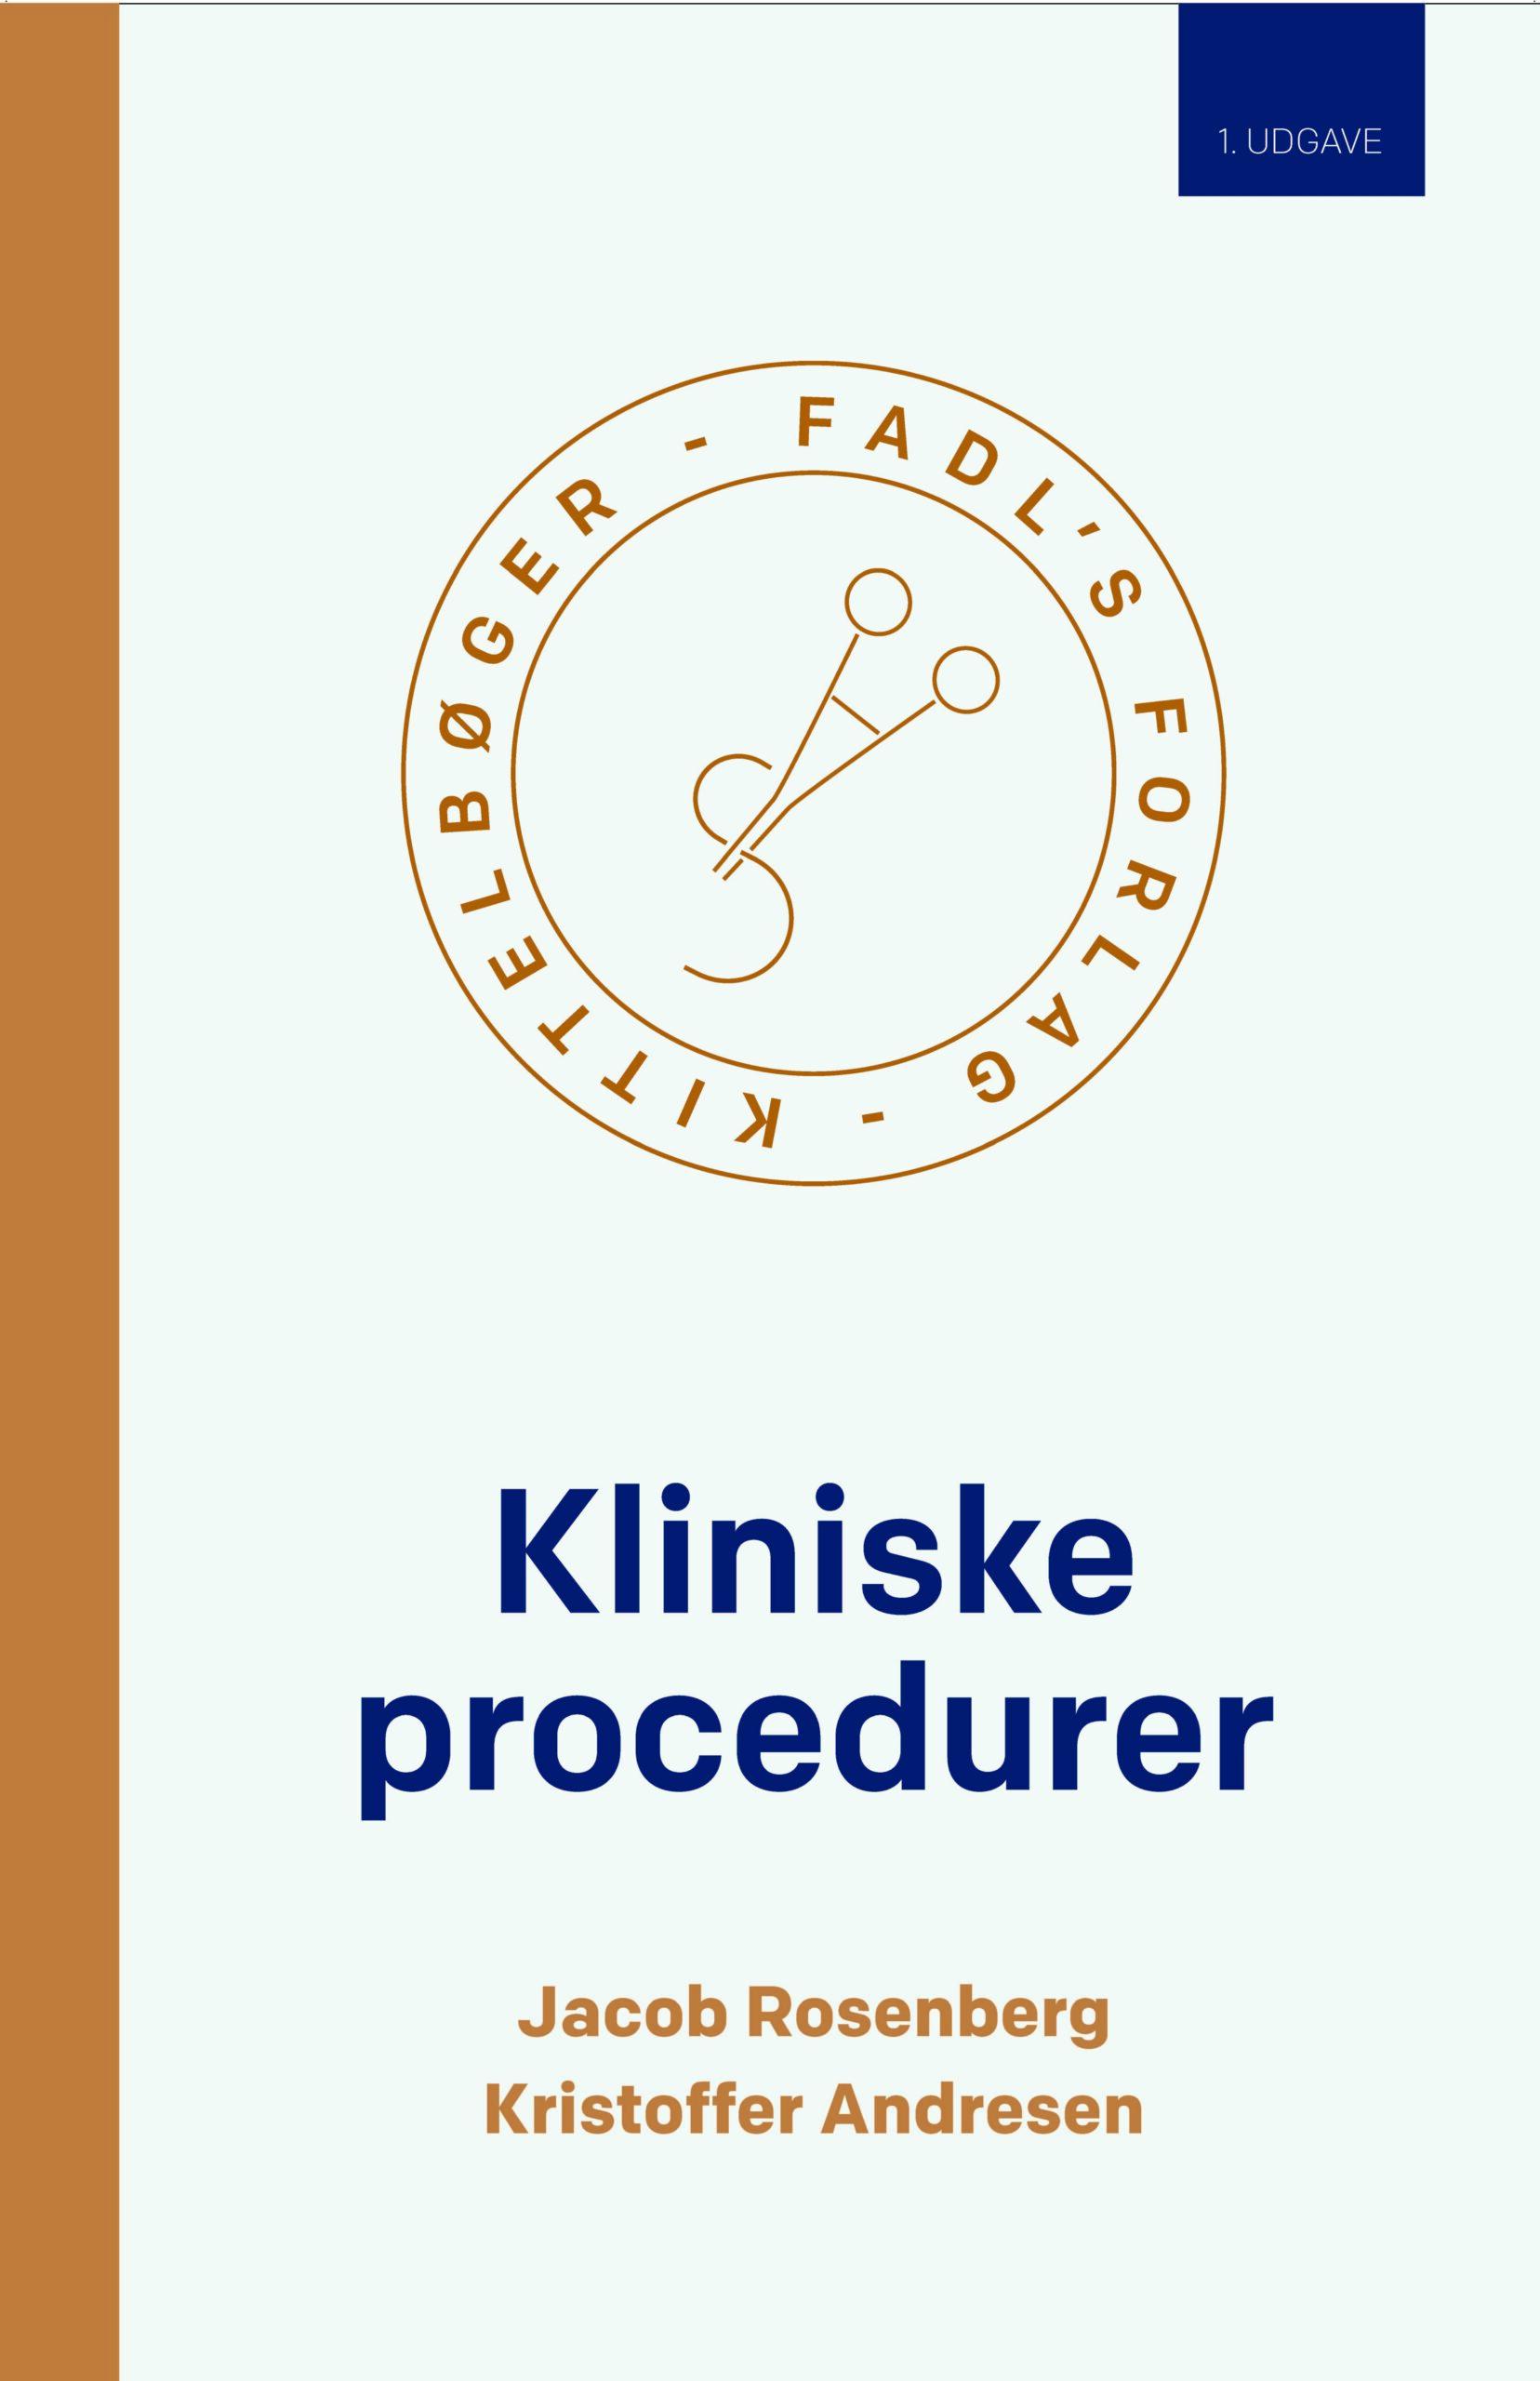 Kliniske procedurer